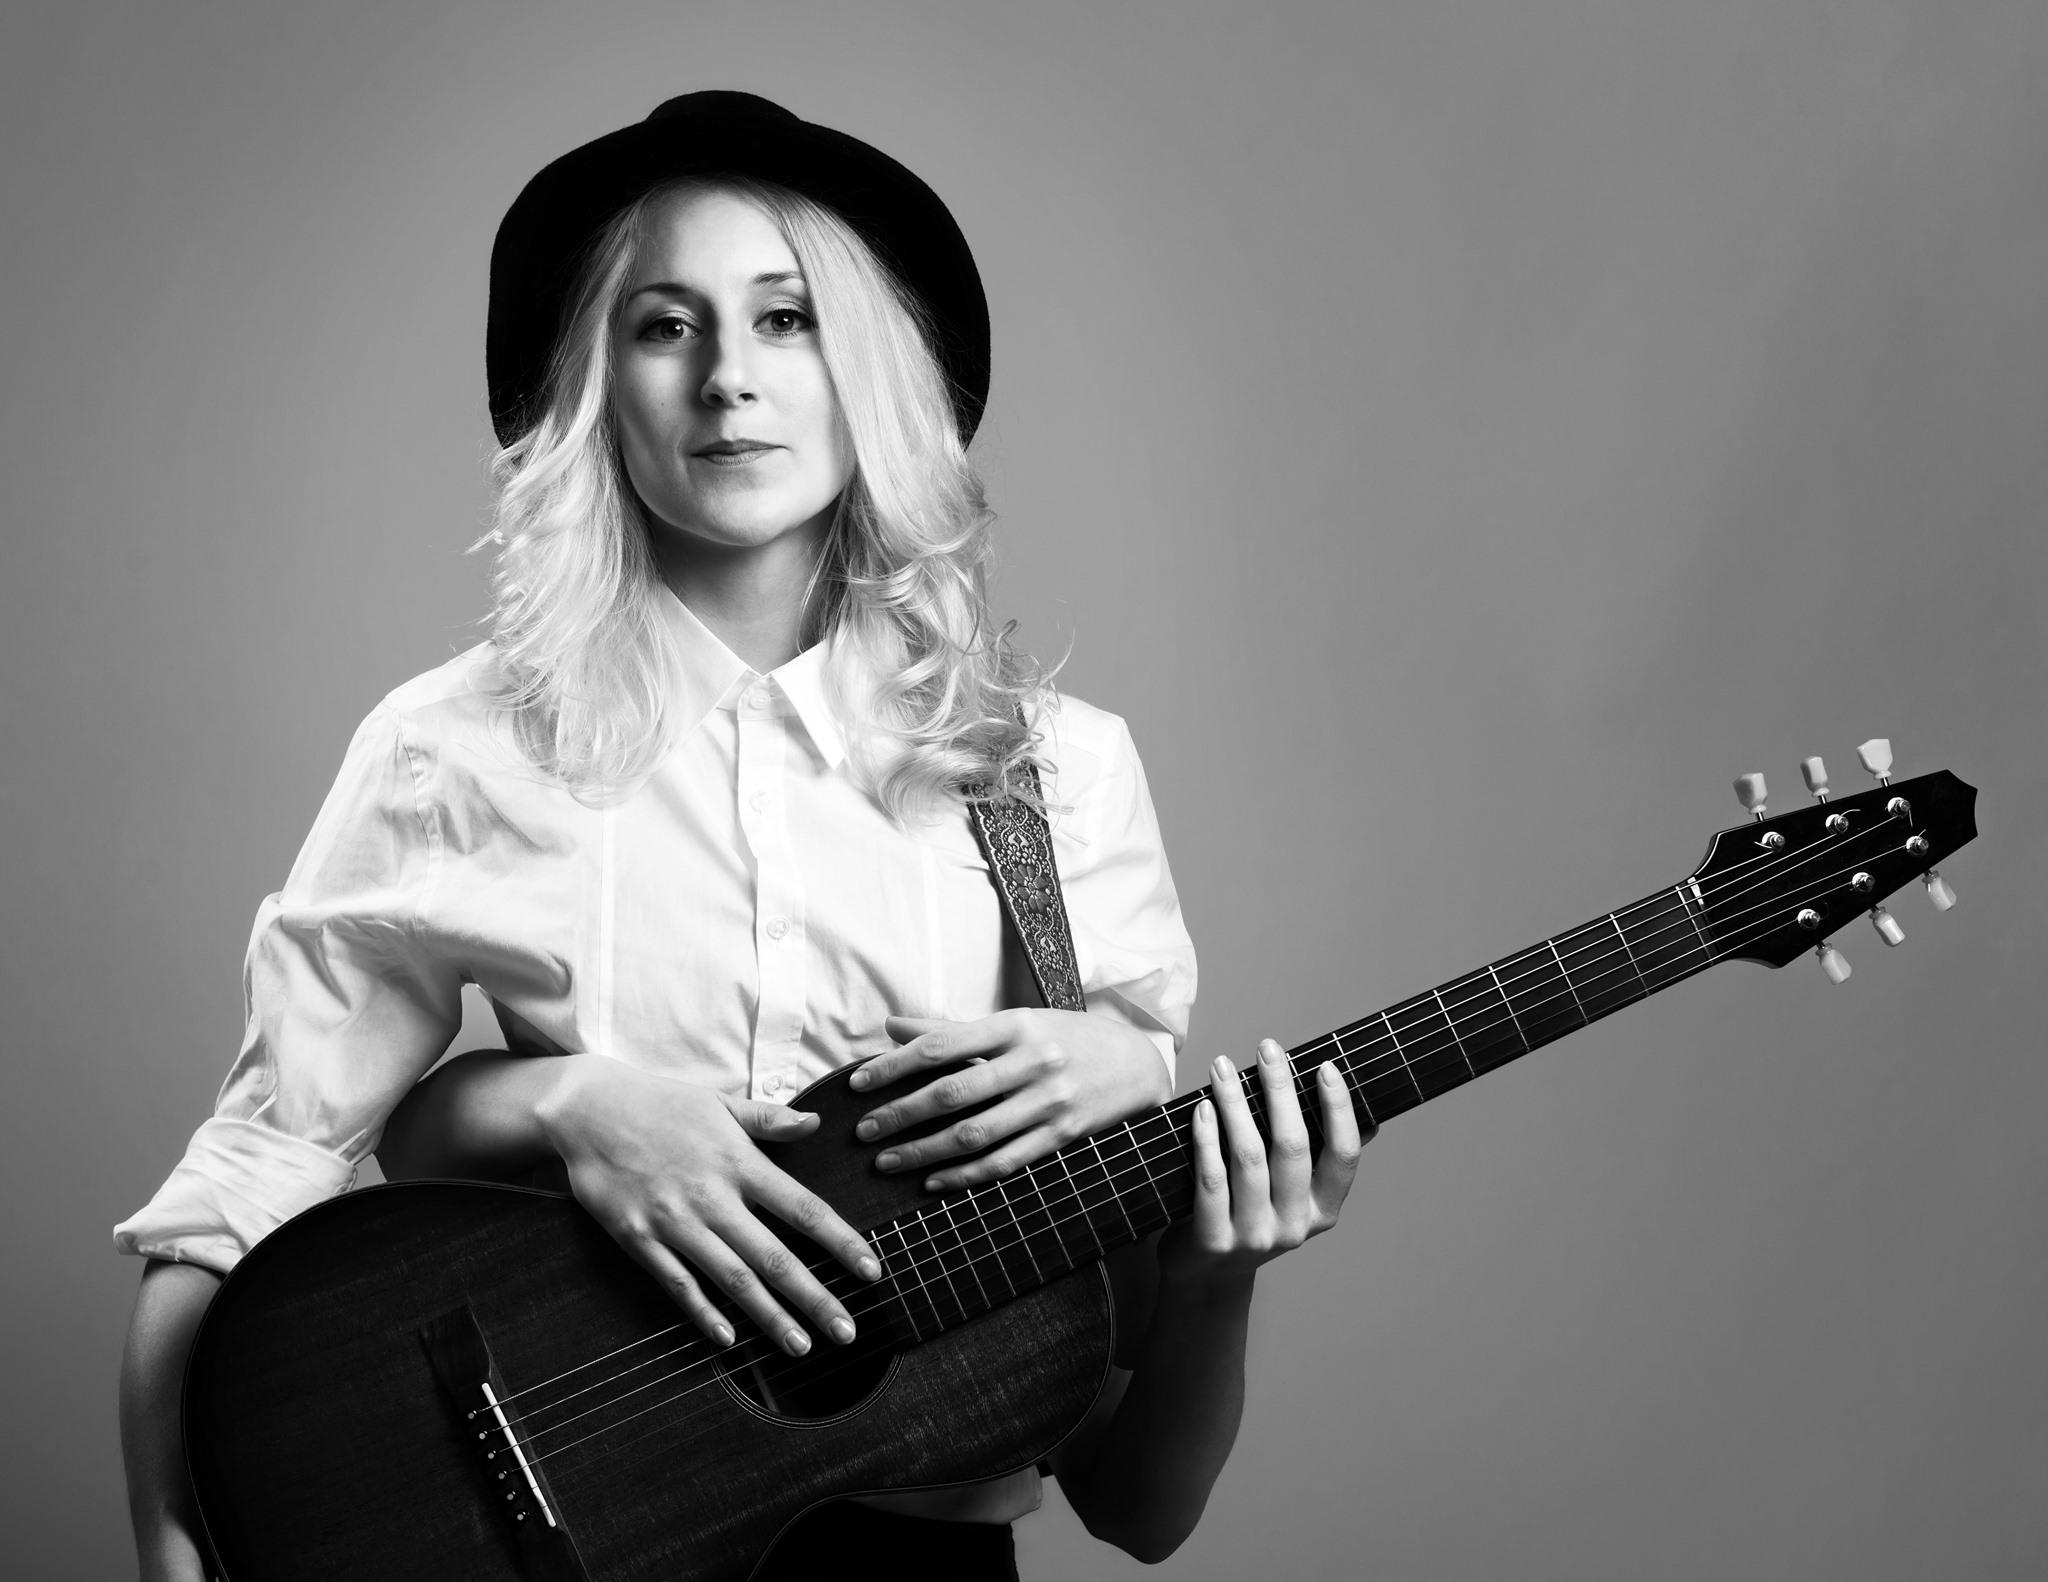 Svartvit bild på Frida Andersson med sin gitarr. Foto: Christoffer Relander